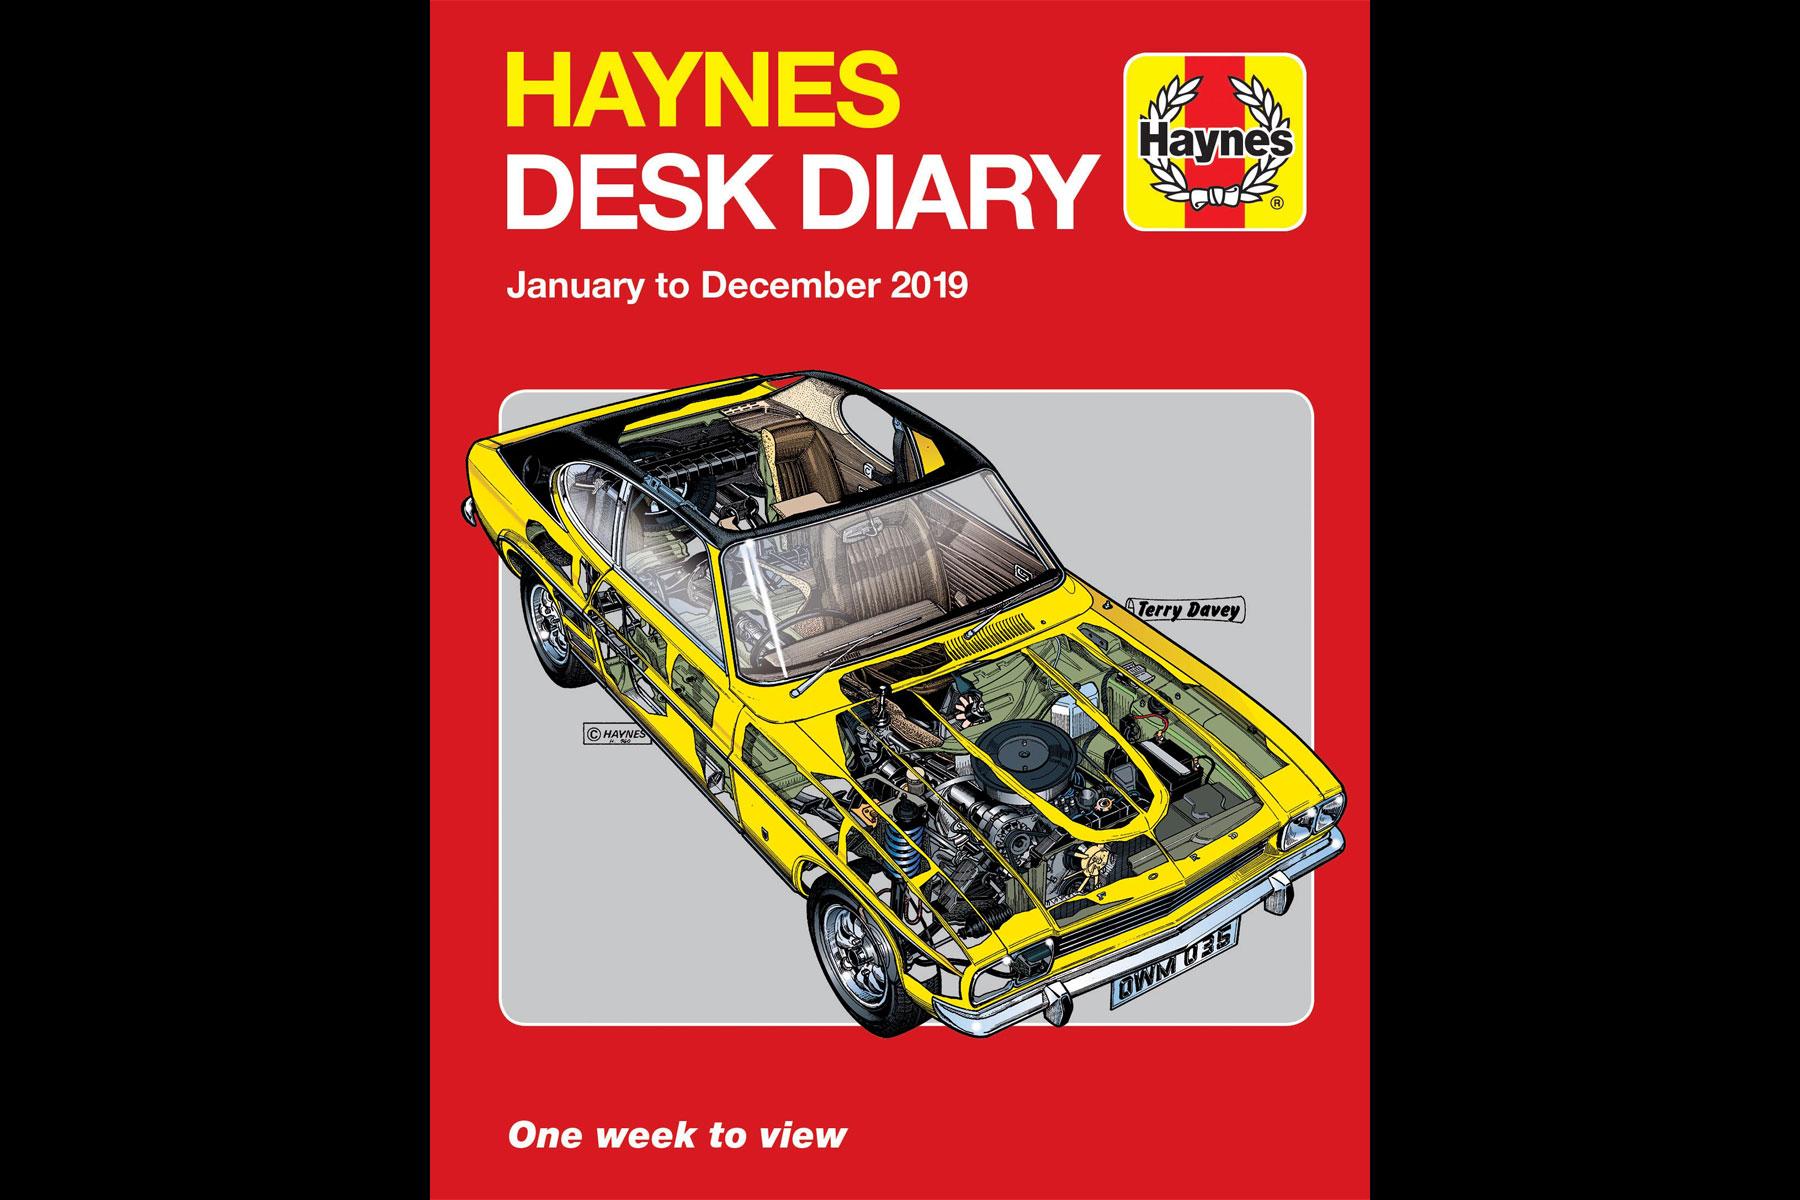 Haynes Desk Diary